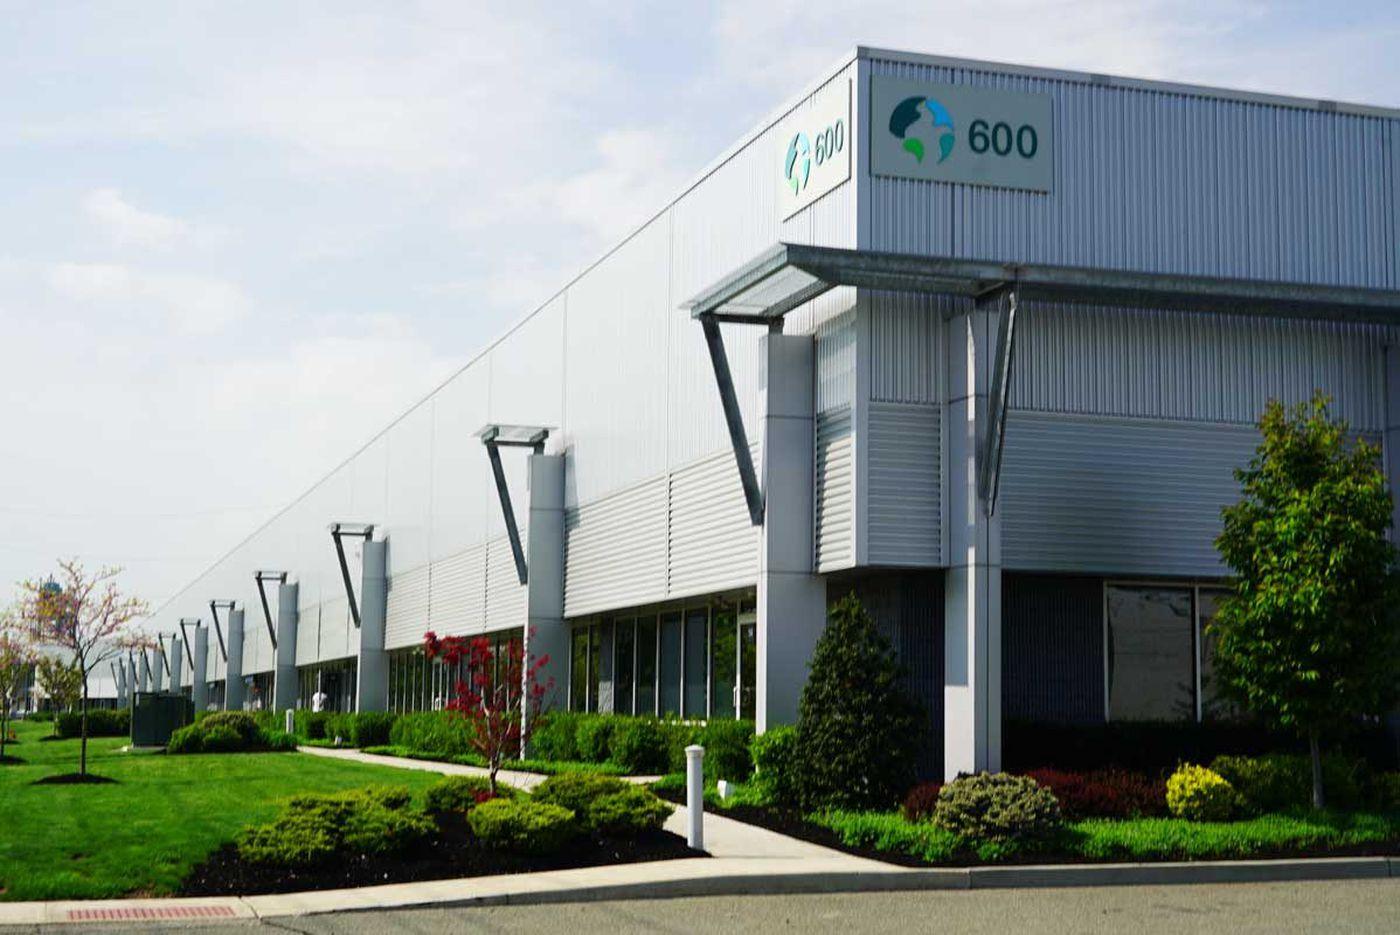 Another warehouse to grow medical marijuana set in N.J.